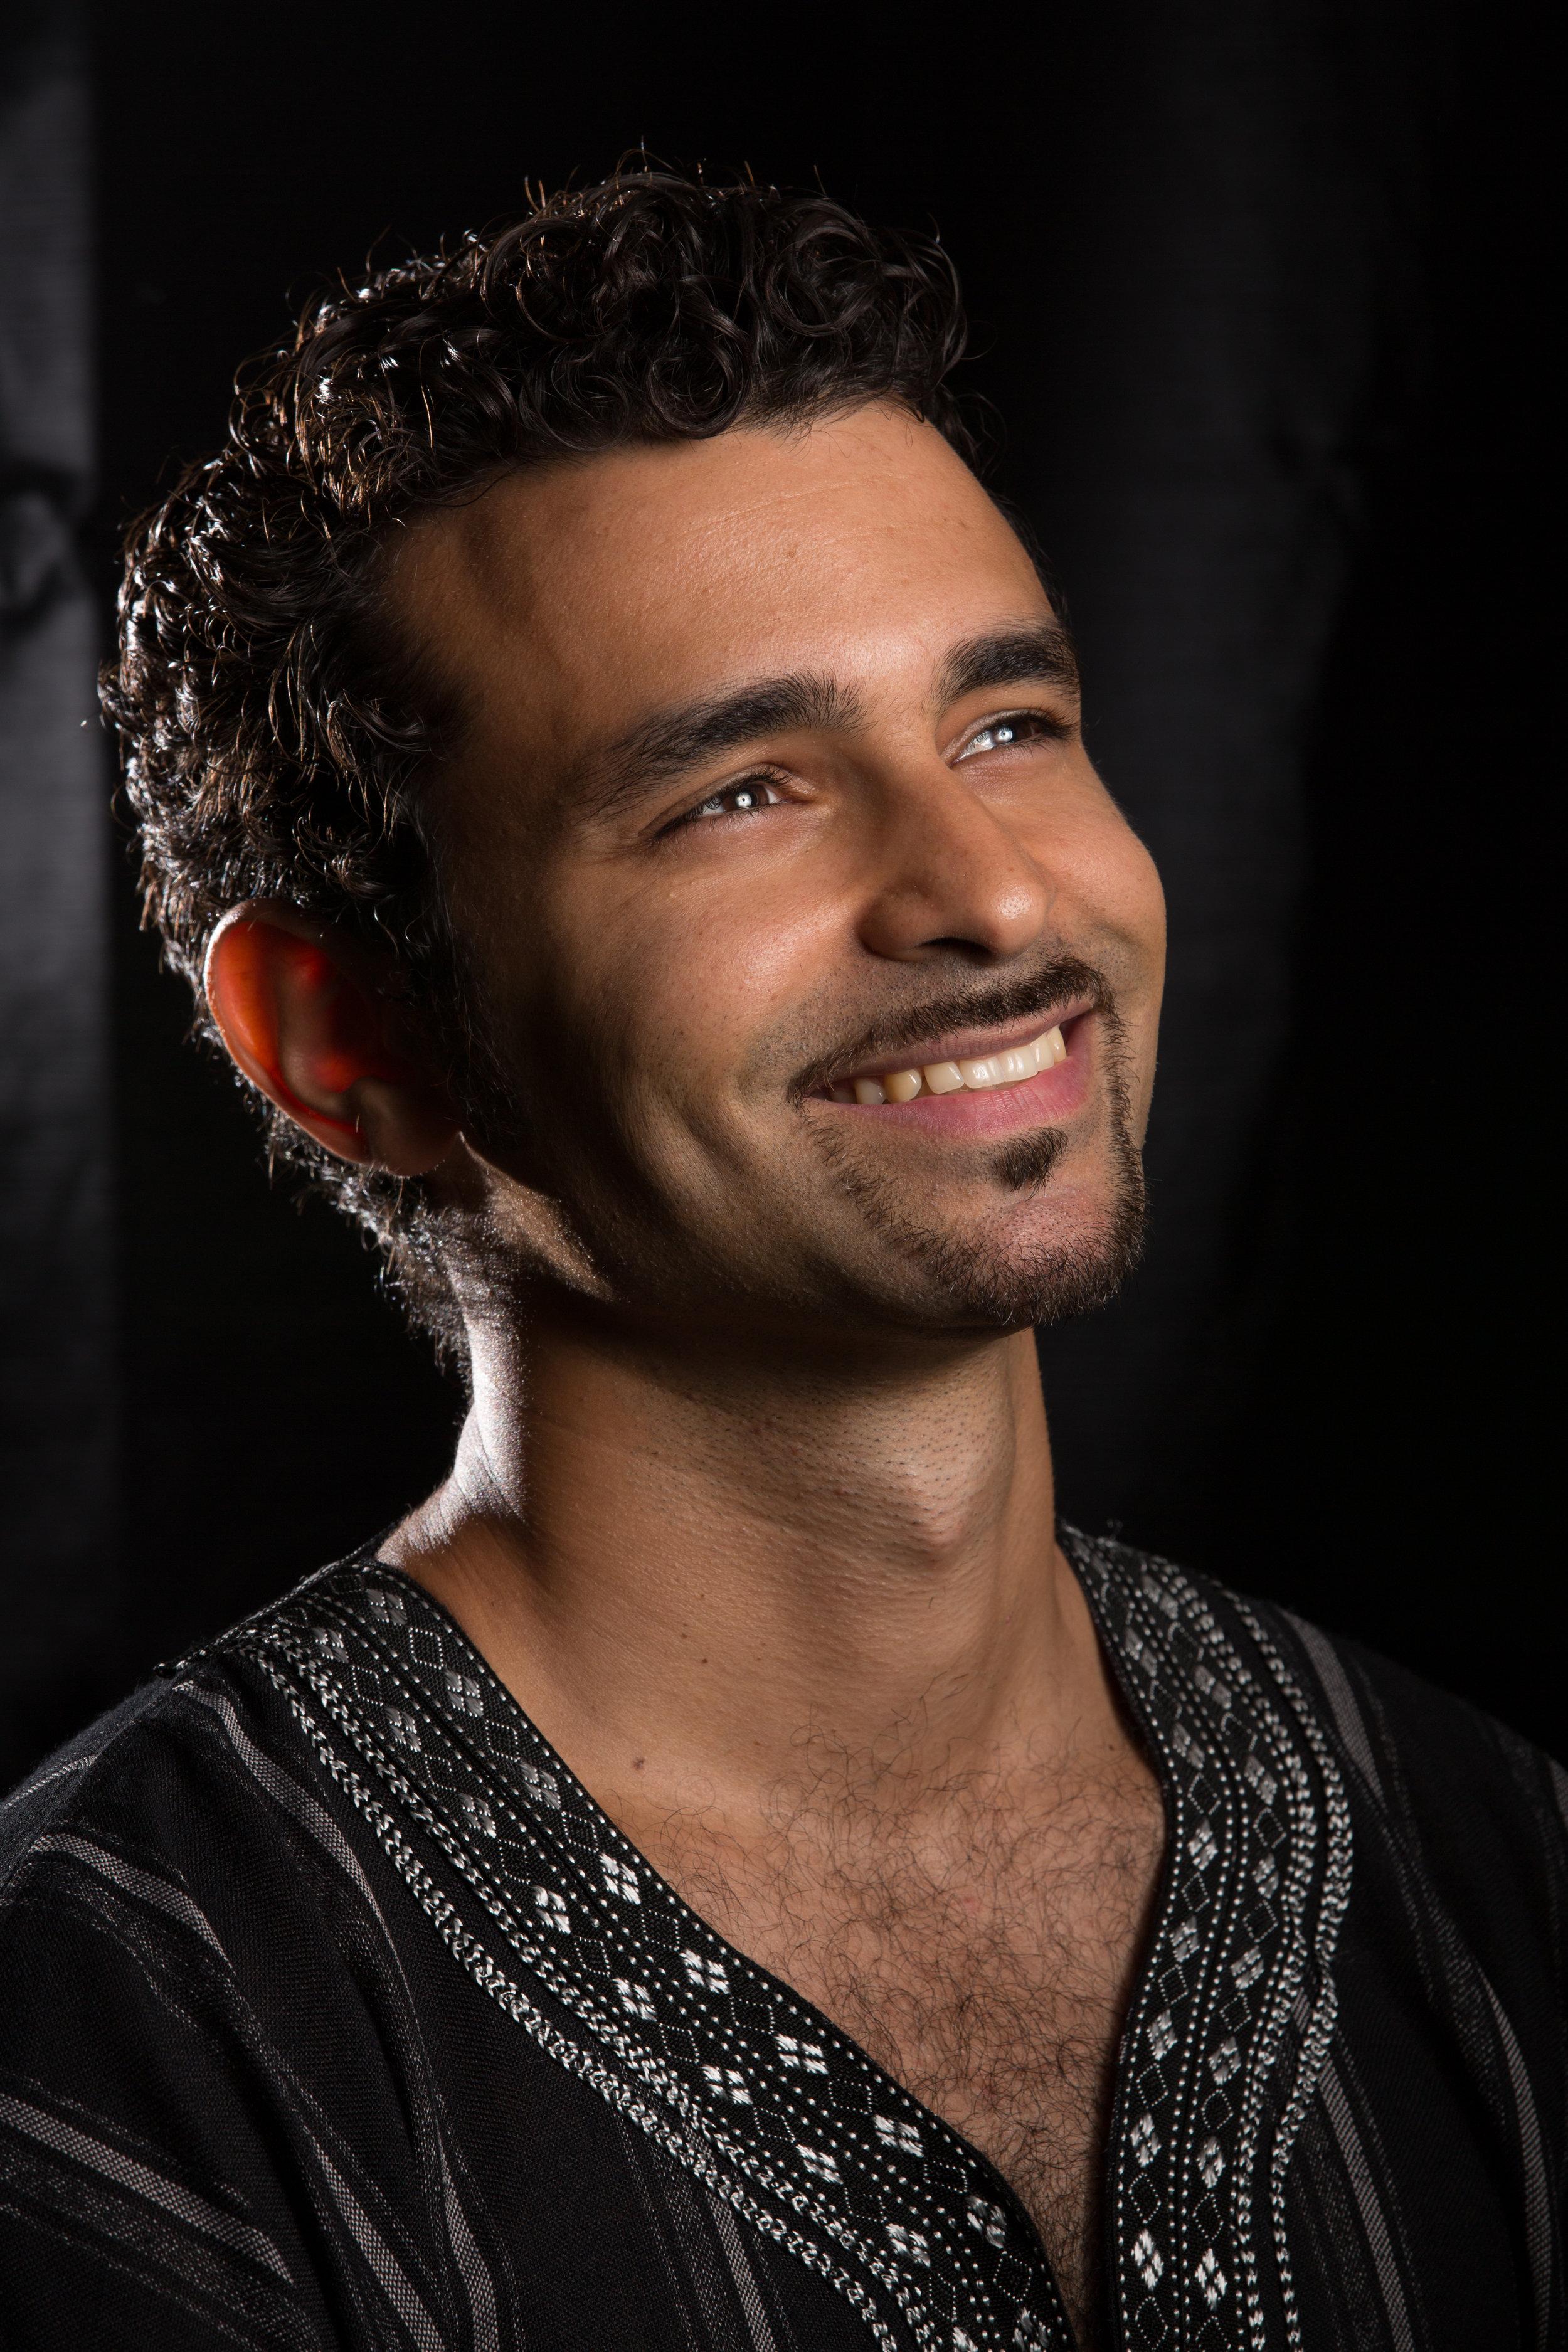 a0792b80127b-Zakaria_Alaoui__Smile_.jpg